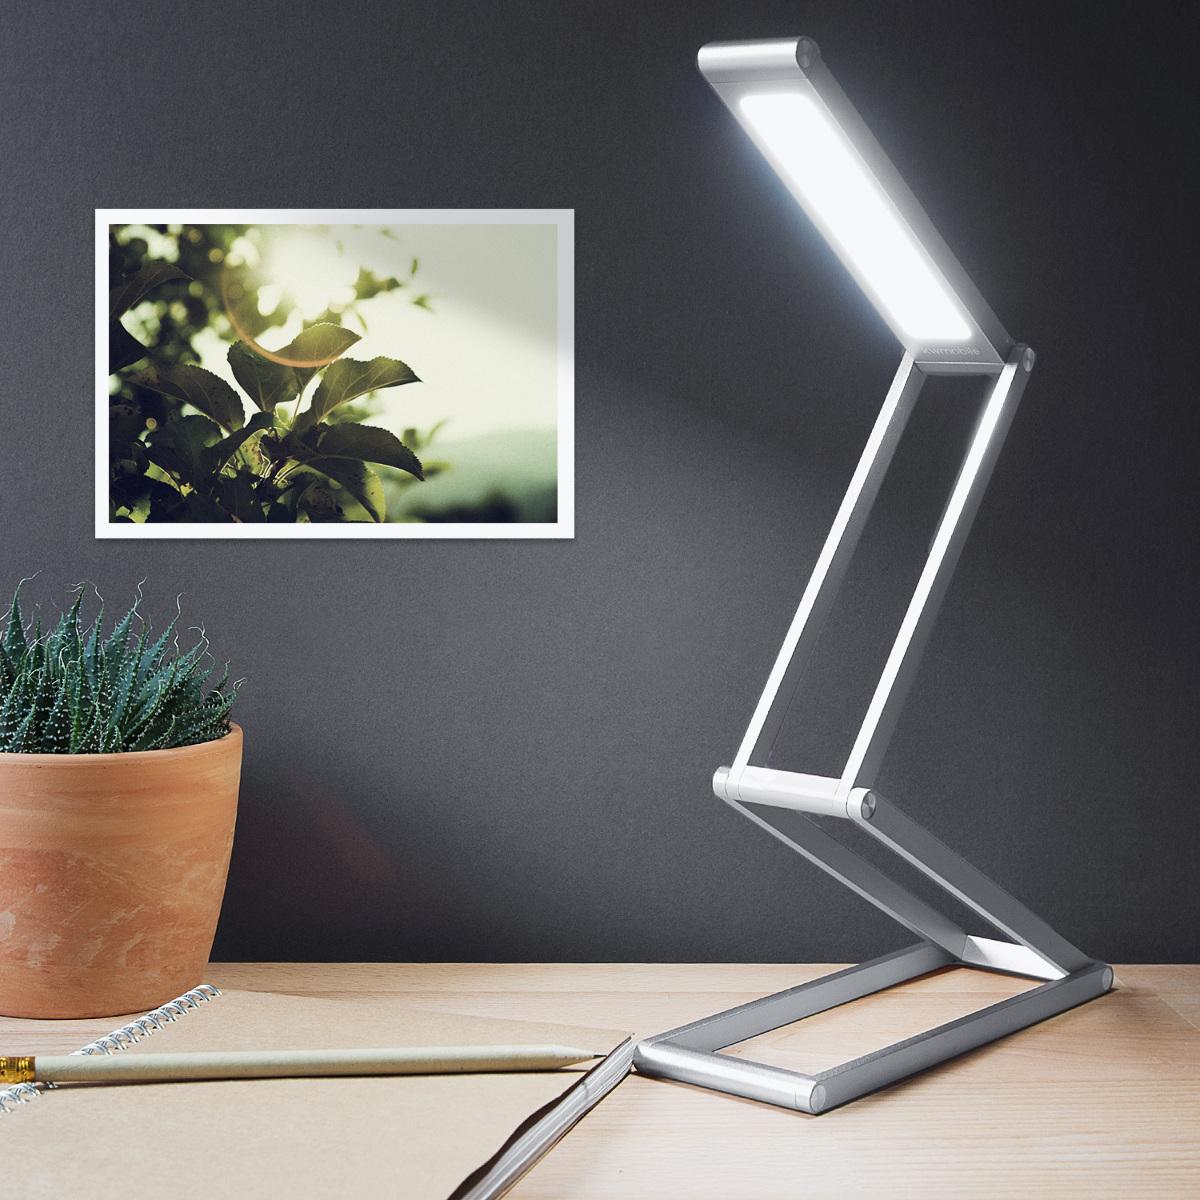 led aluminium leselampe mit schwenkkopf akku tischlampe. Black Bedroom Furniture Sets. Home Design Ideas